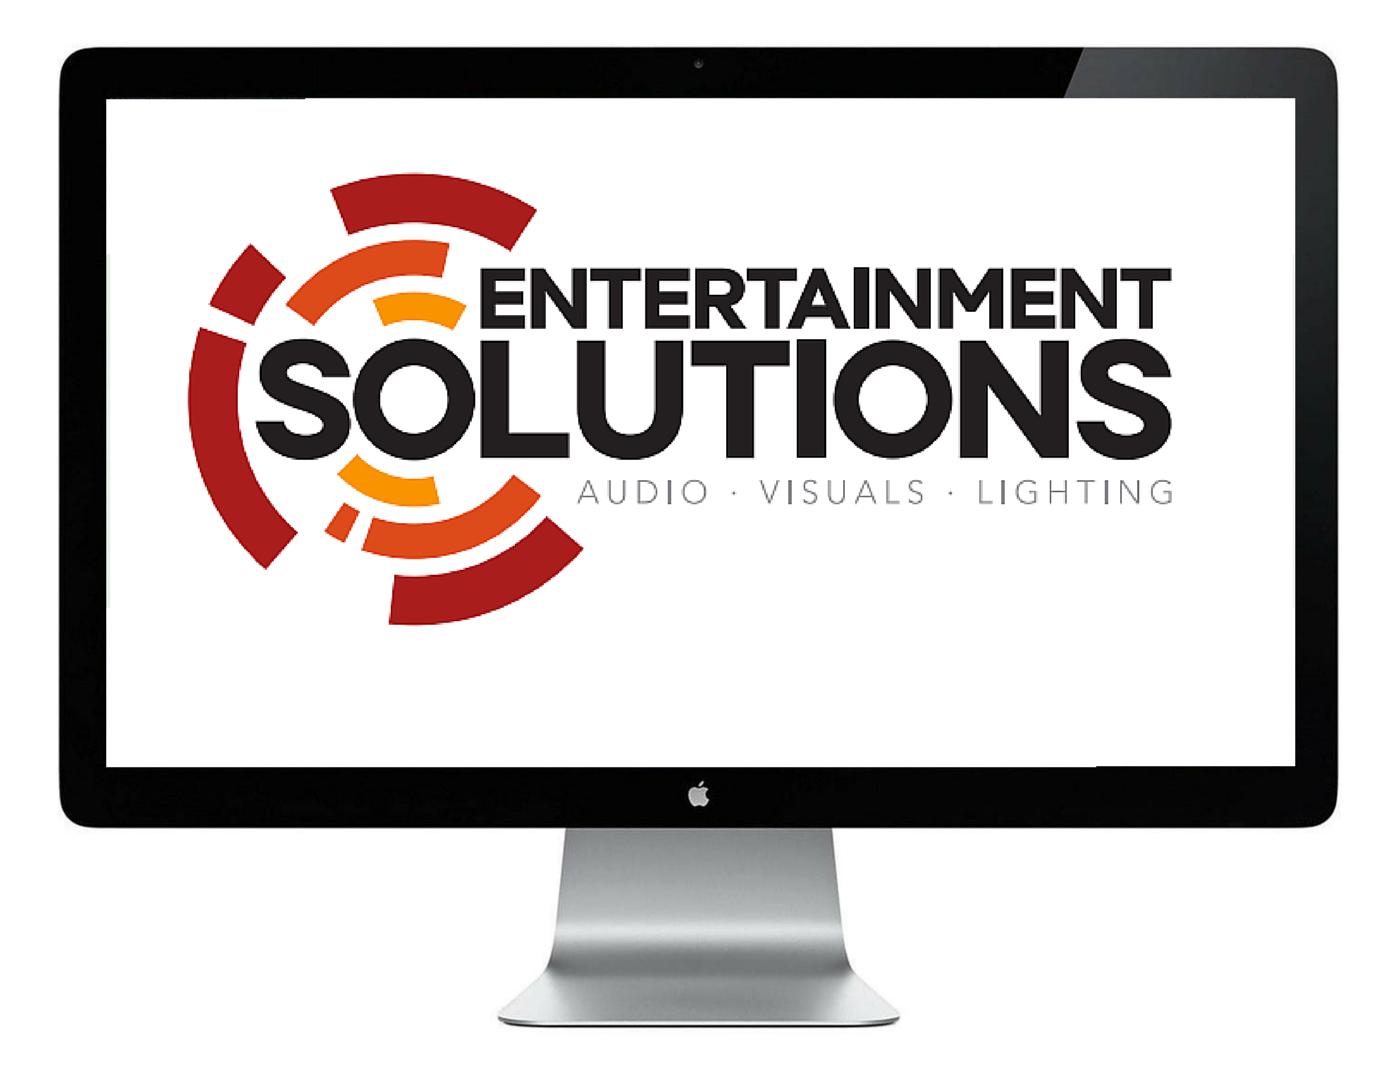 Entertainment Solution